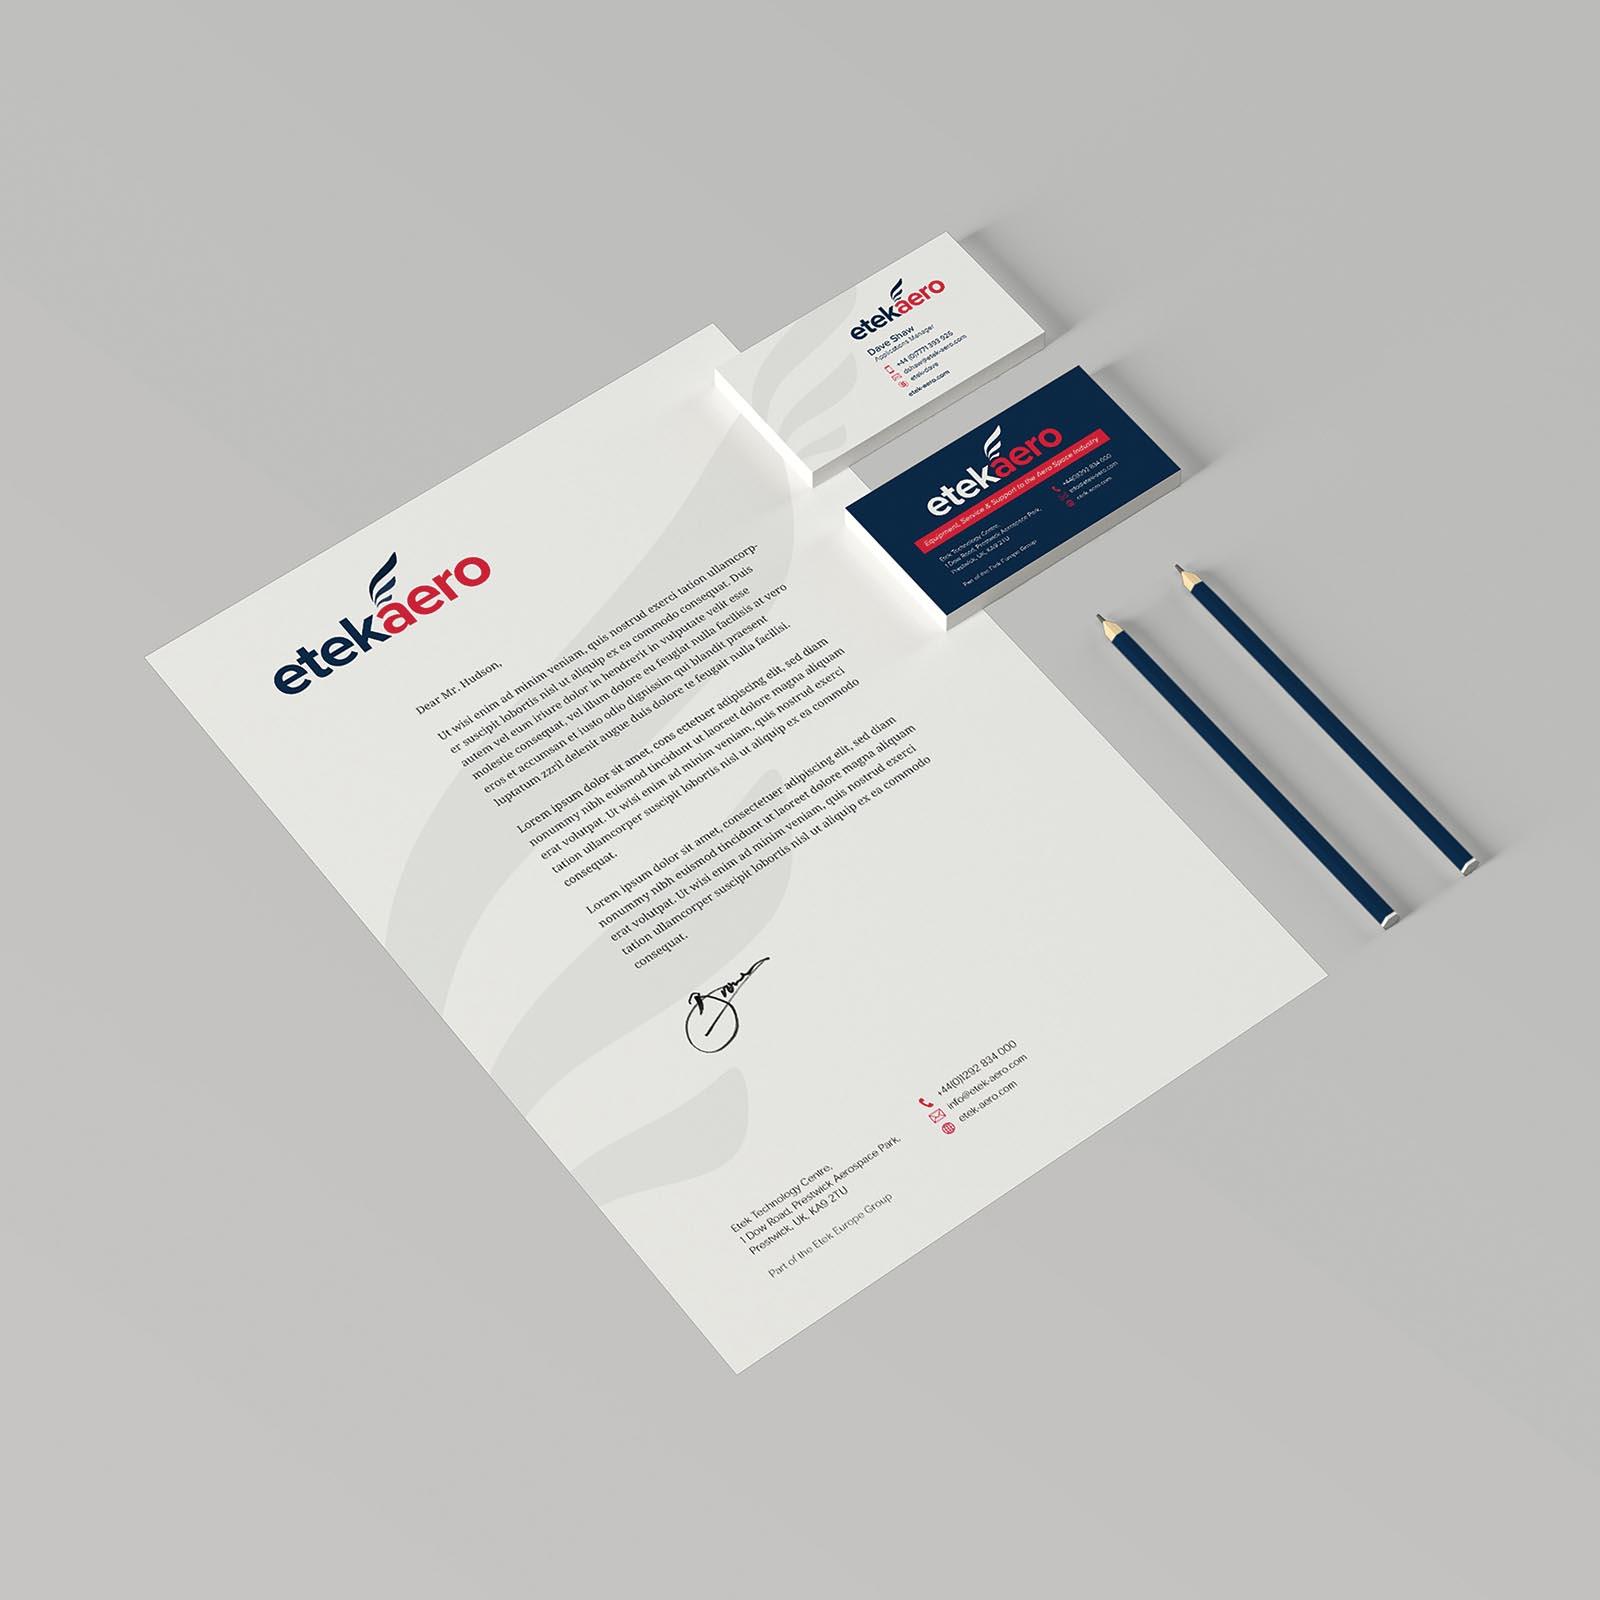 Etek-Aero-Branding-Ayrshire